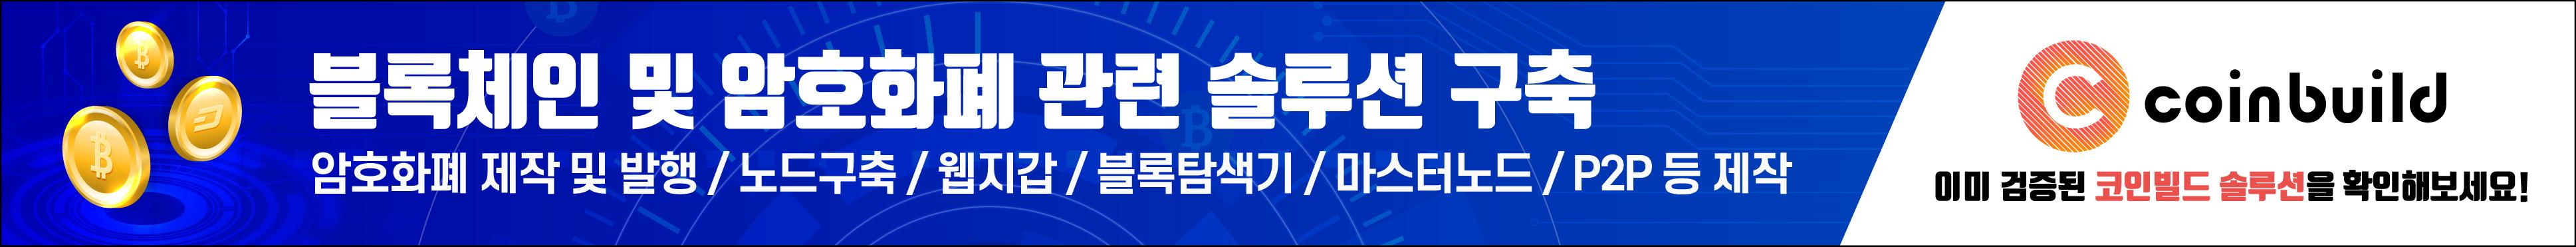 banner_coinbuild_20190822_1860x178-border-1px.jpg